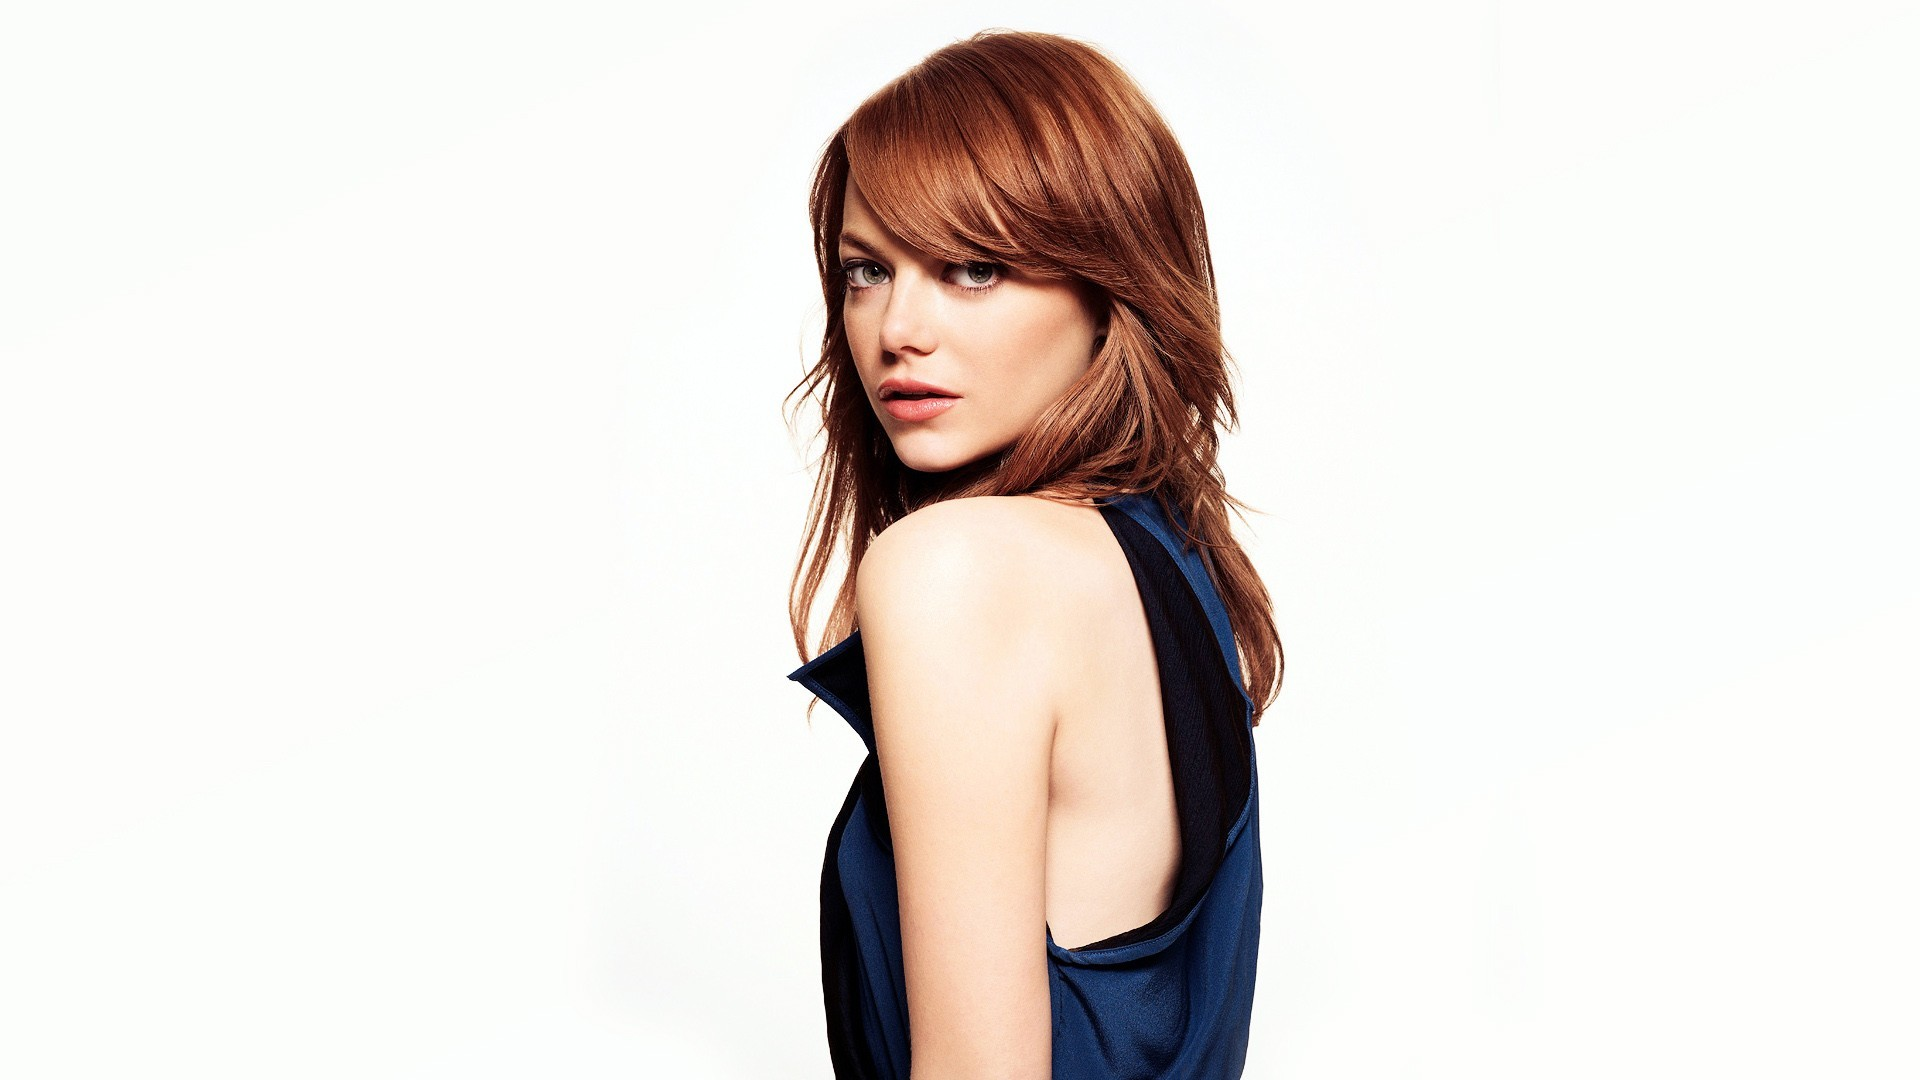 … x 1080 Original. Description: Download Emma Stone 18 Emma Stone  wallpaper …